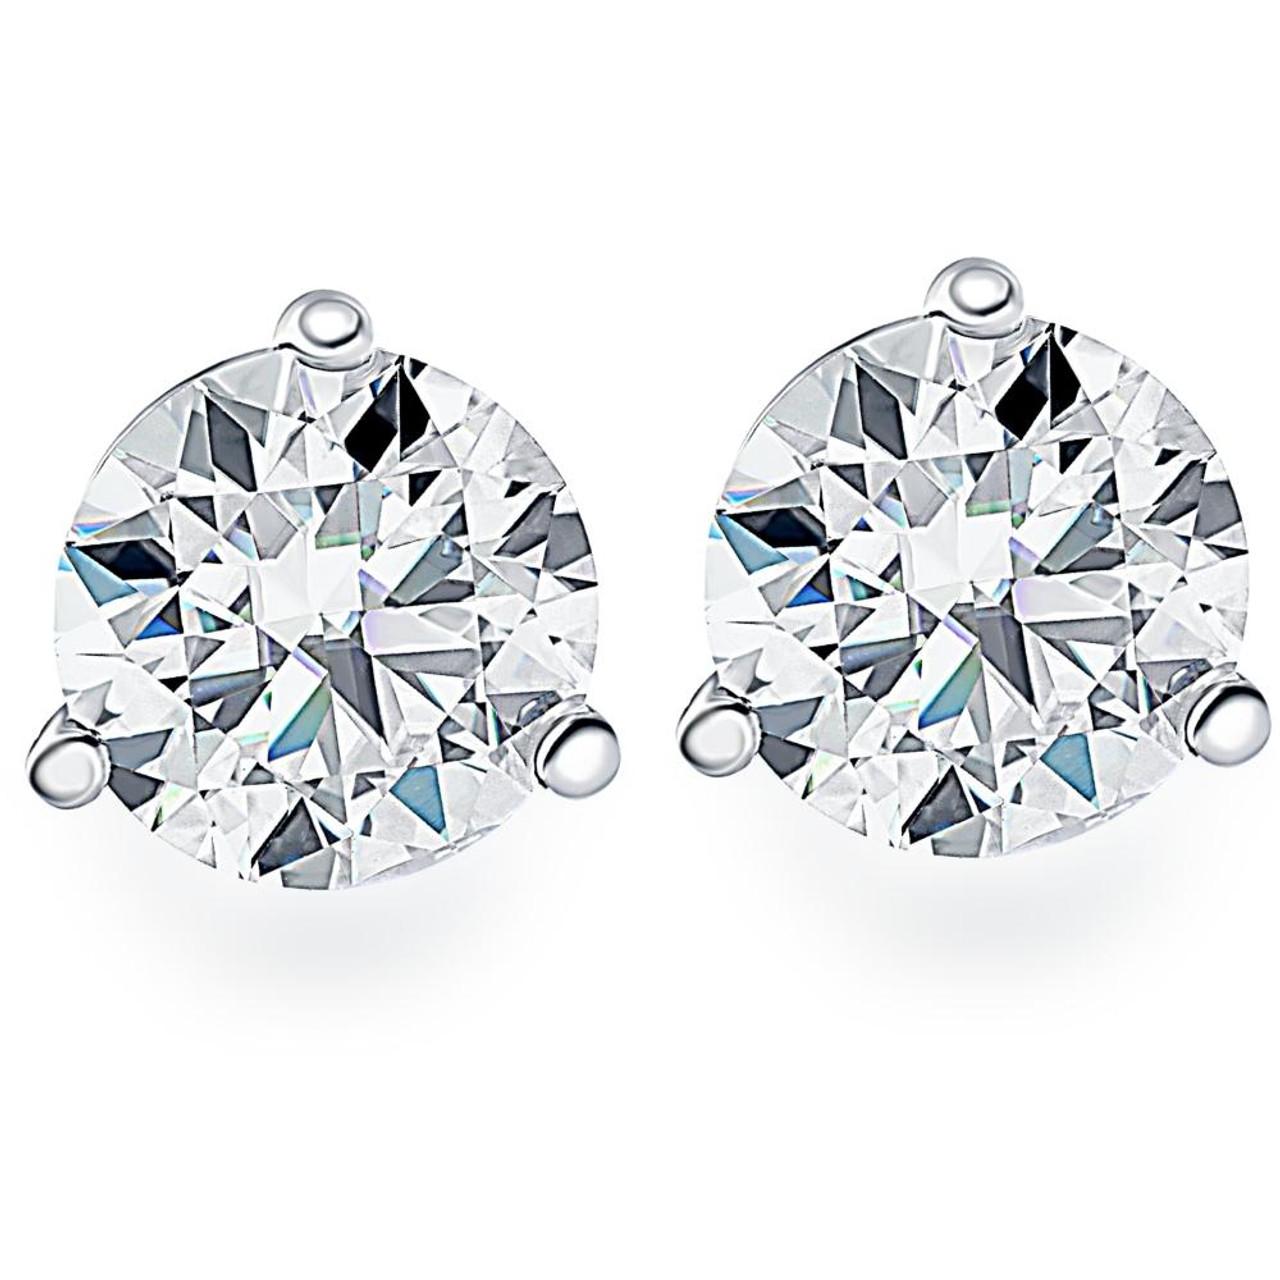 Black Diamond Studs 1.25CT Round Brilliant Cut Black Diamond Stud Earrings In 14K Gold